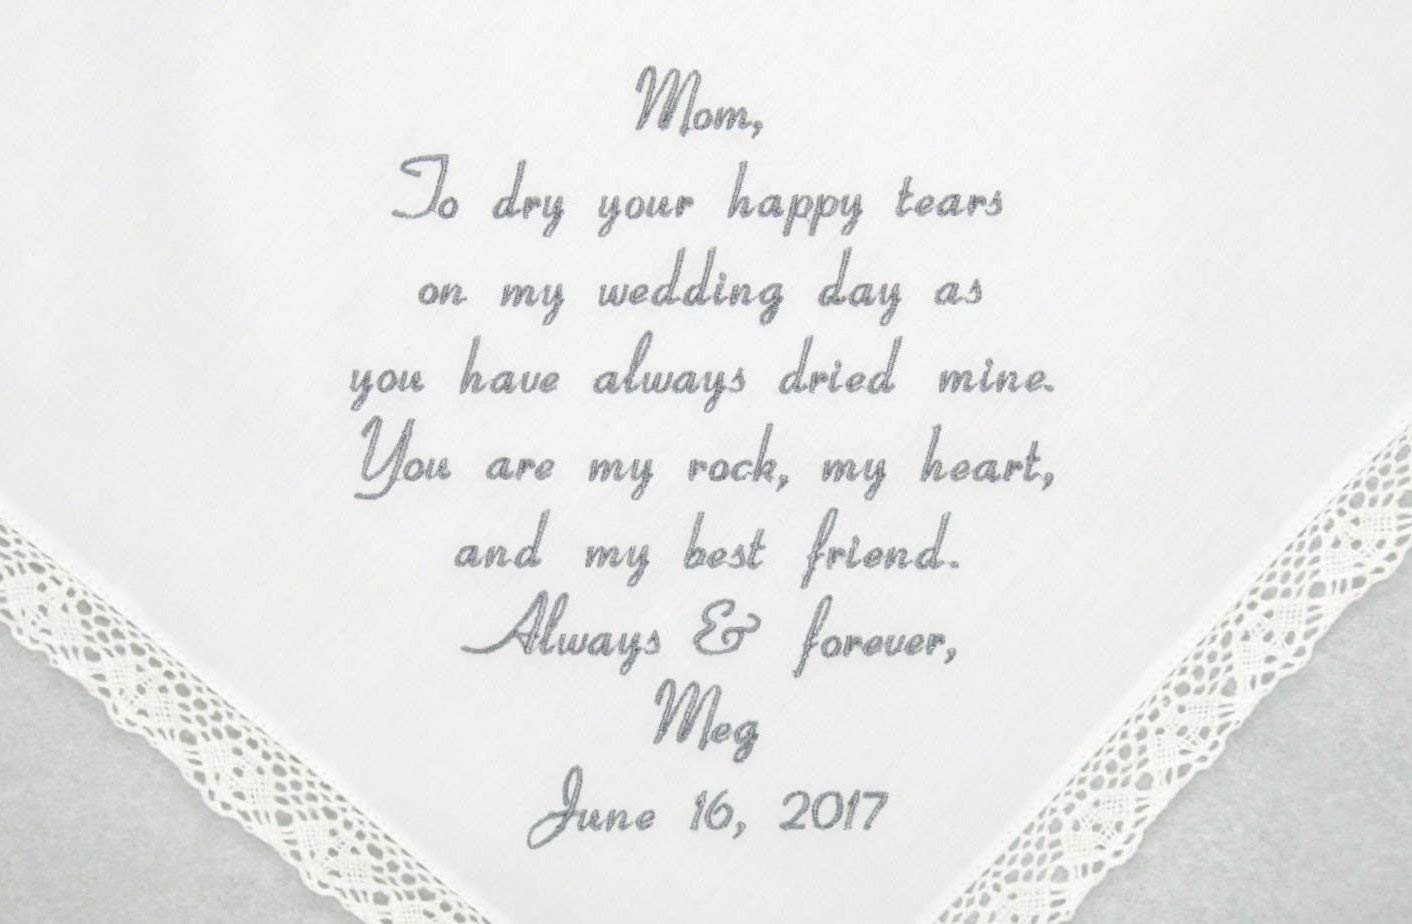 custom hankerchief for mother embroidered thank you wedding keepsake gift Mother Wedding Handkerchief Wedding gift for Mom from bride